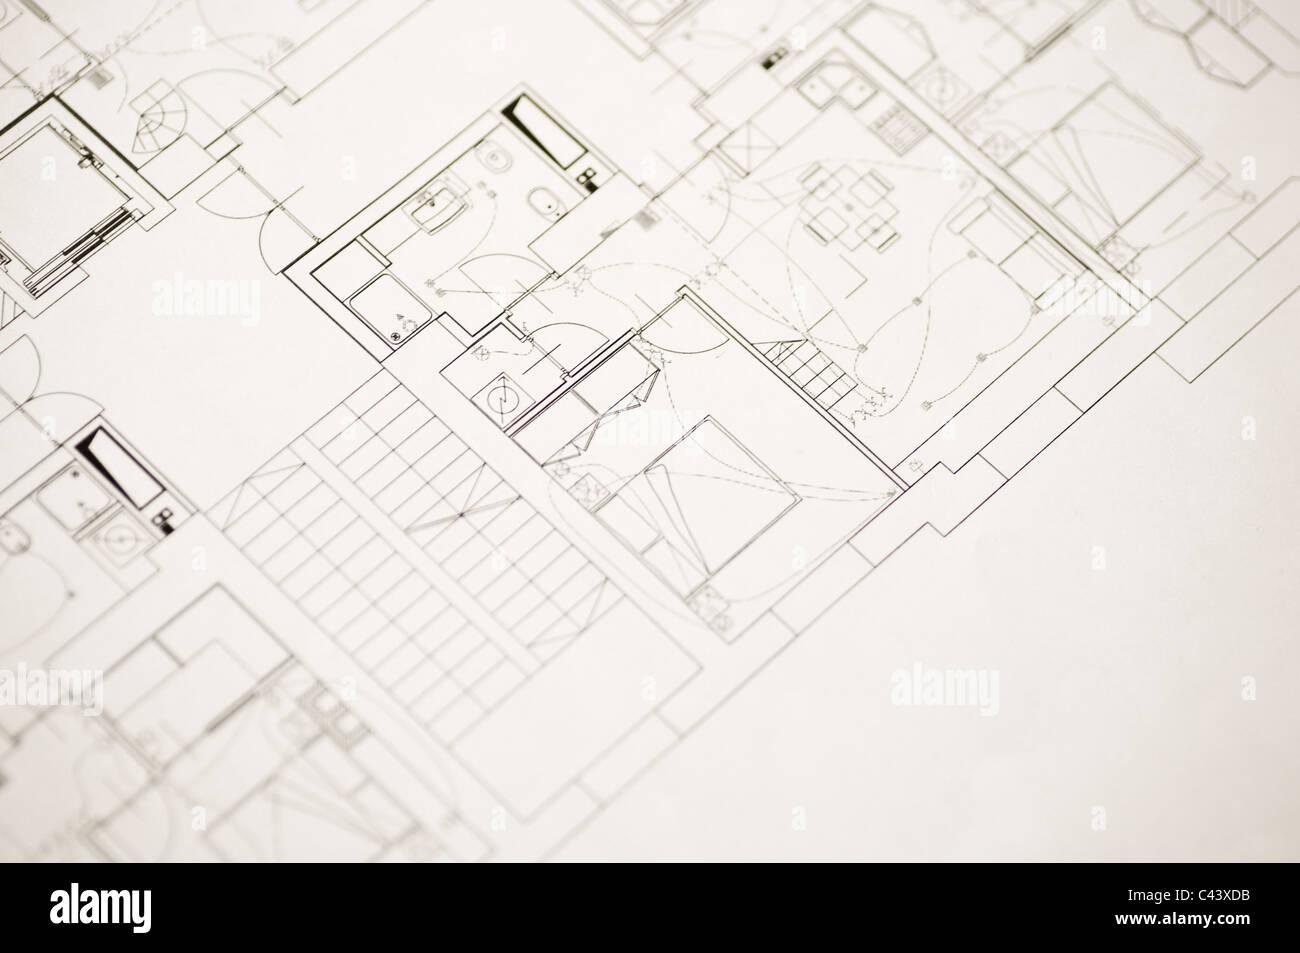 A part of a blueprint. - Stock Image